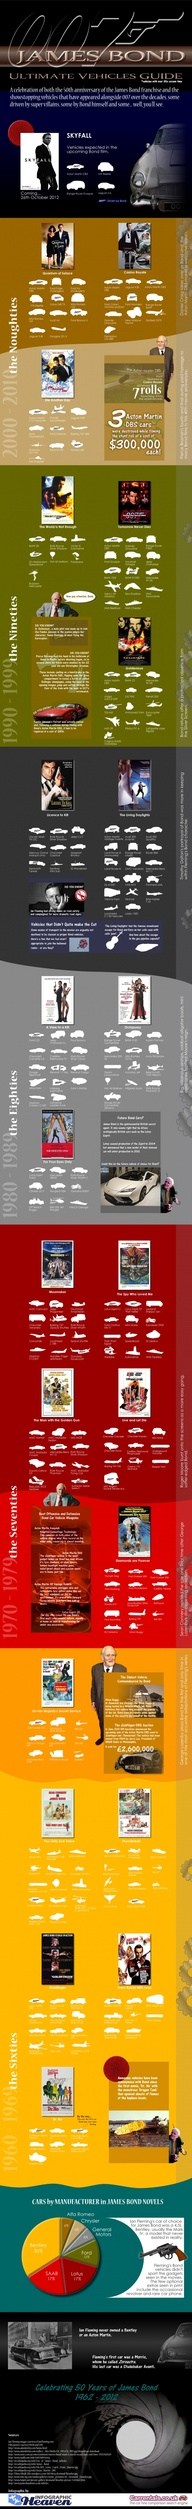 007 - James Bond car